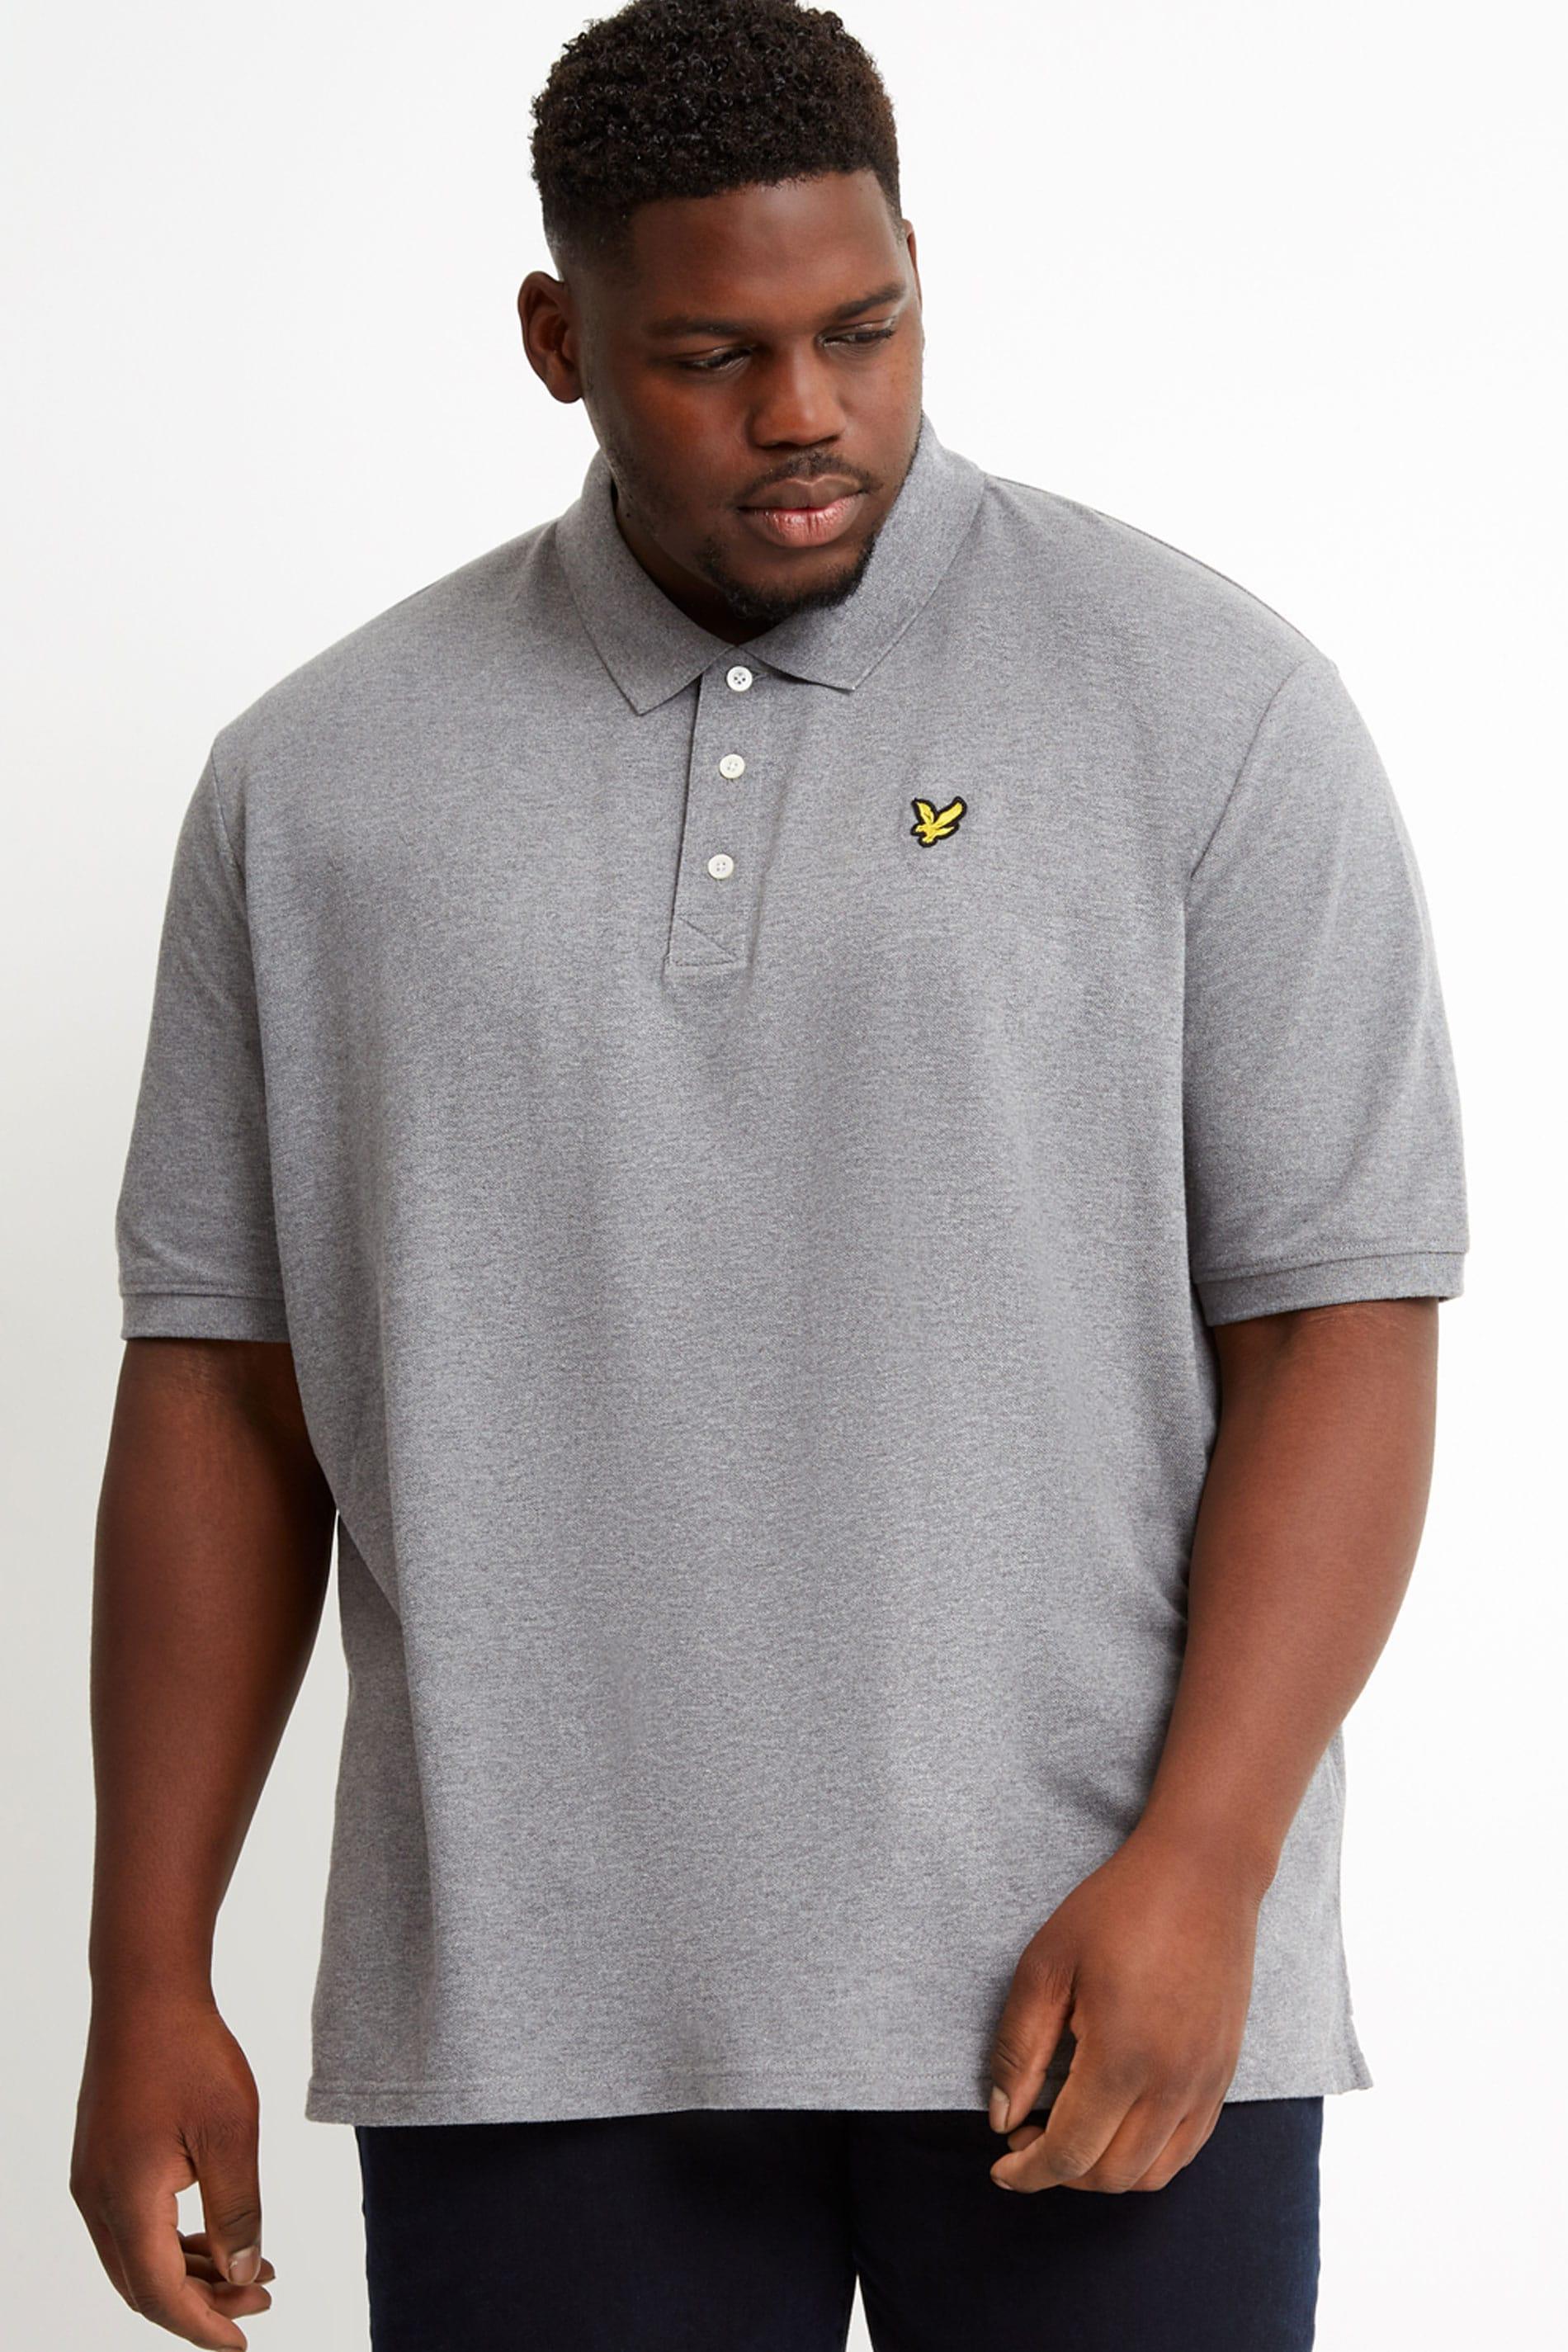 LYLE & SCOTT Light Grey Polo Shirt